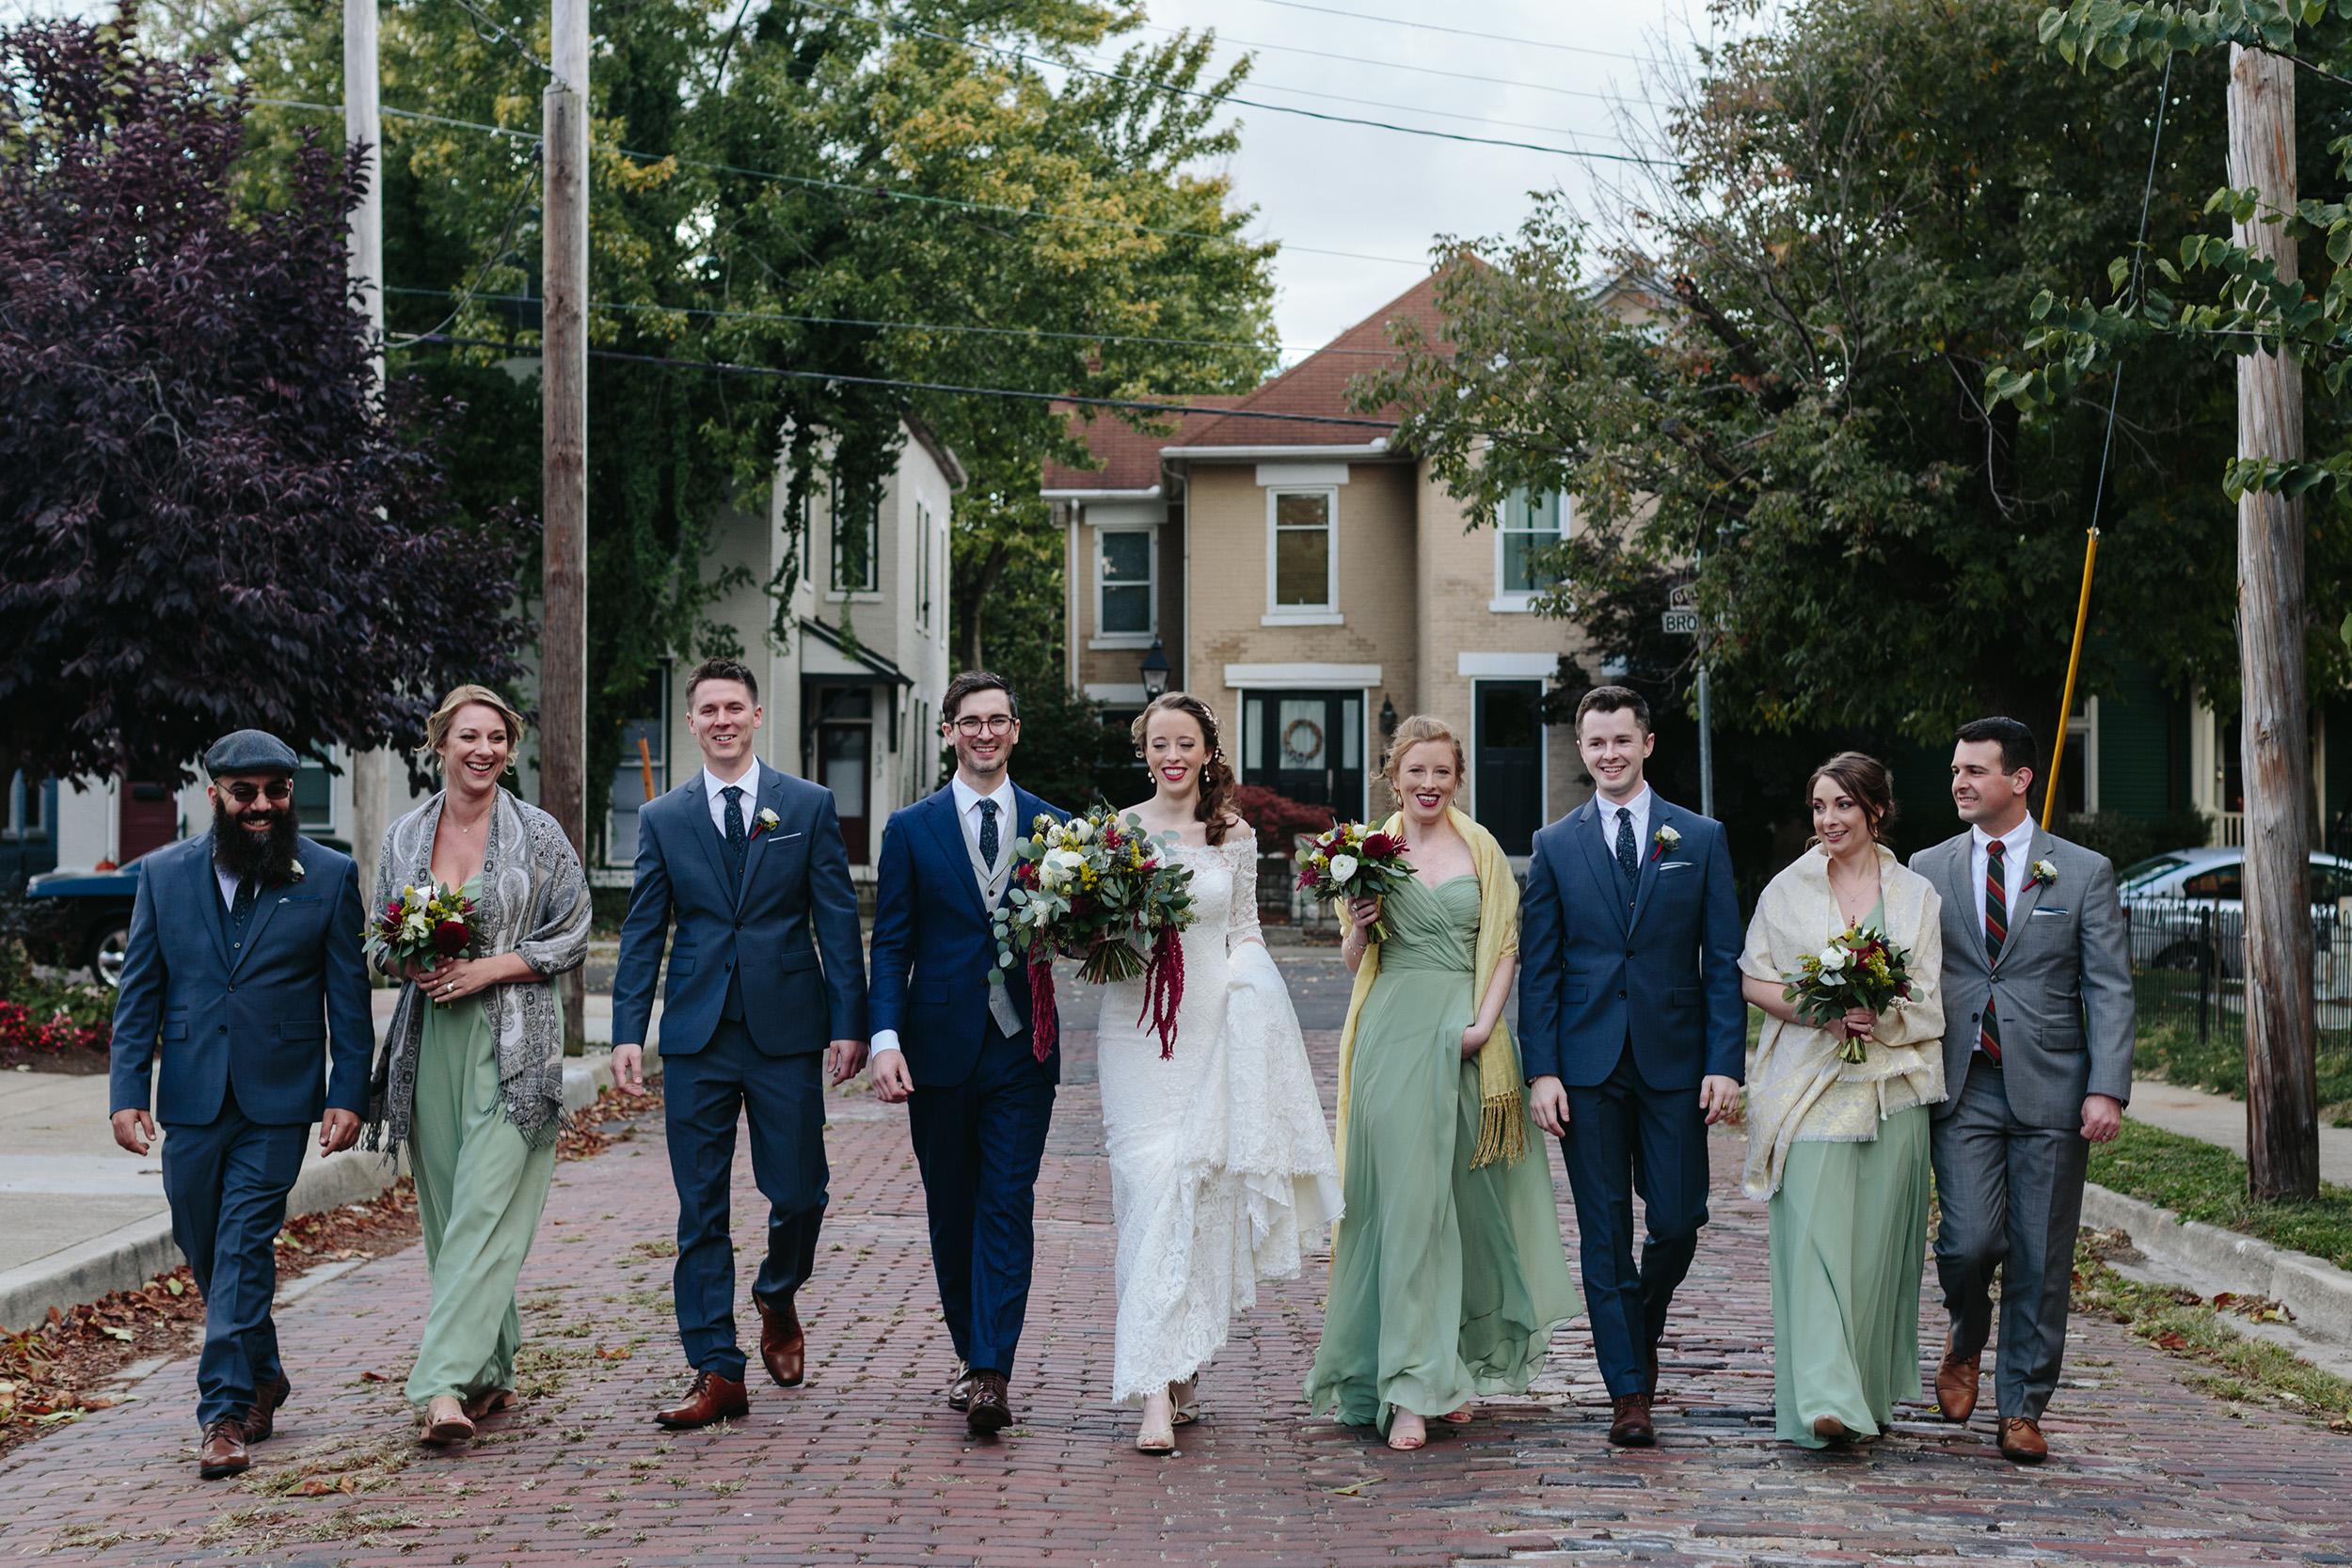 KarliCadel-Wedding-RachelChad-9051.jpg